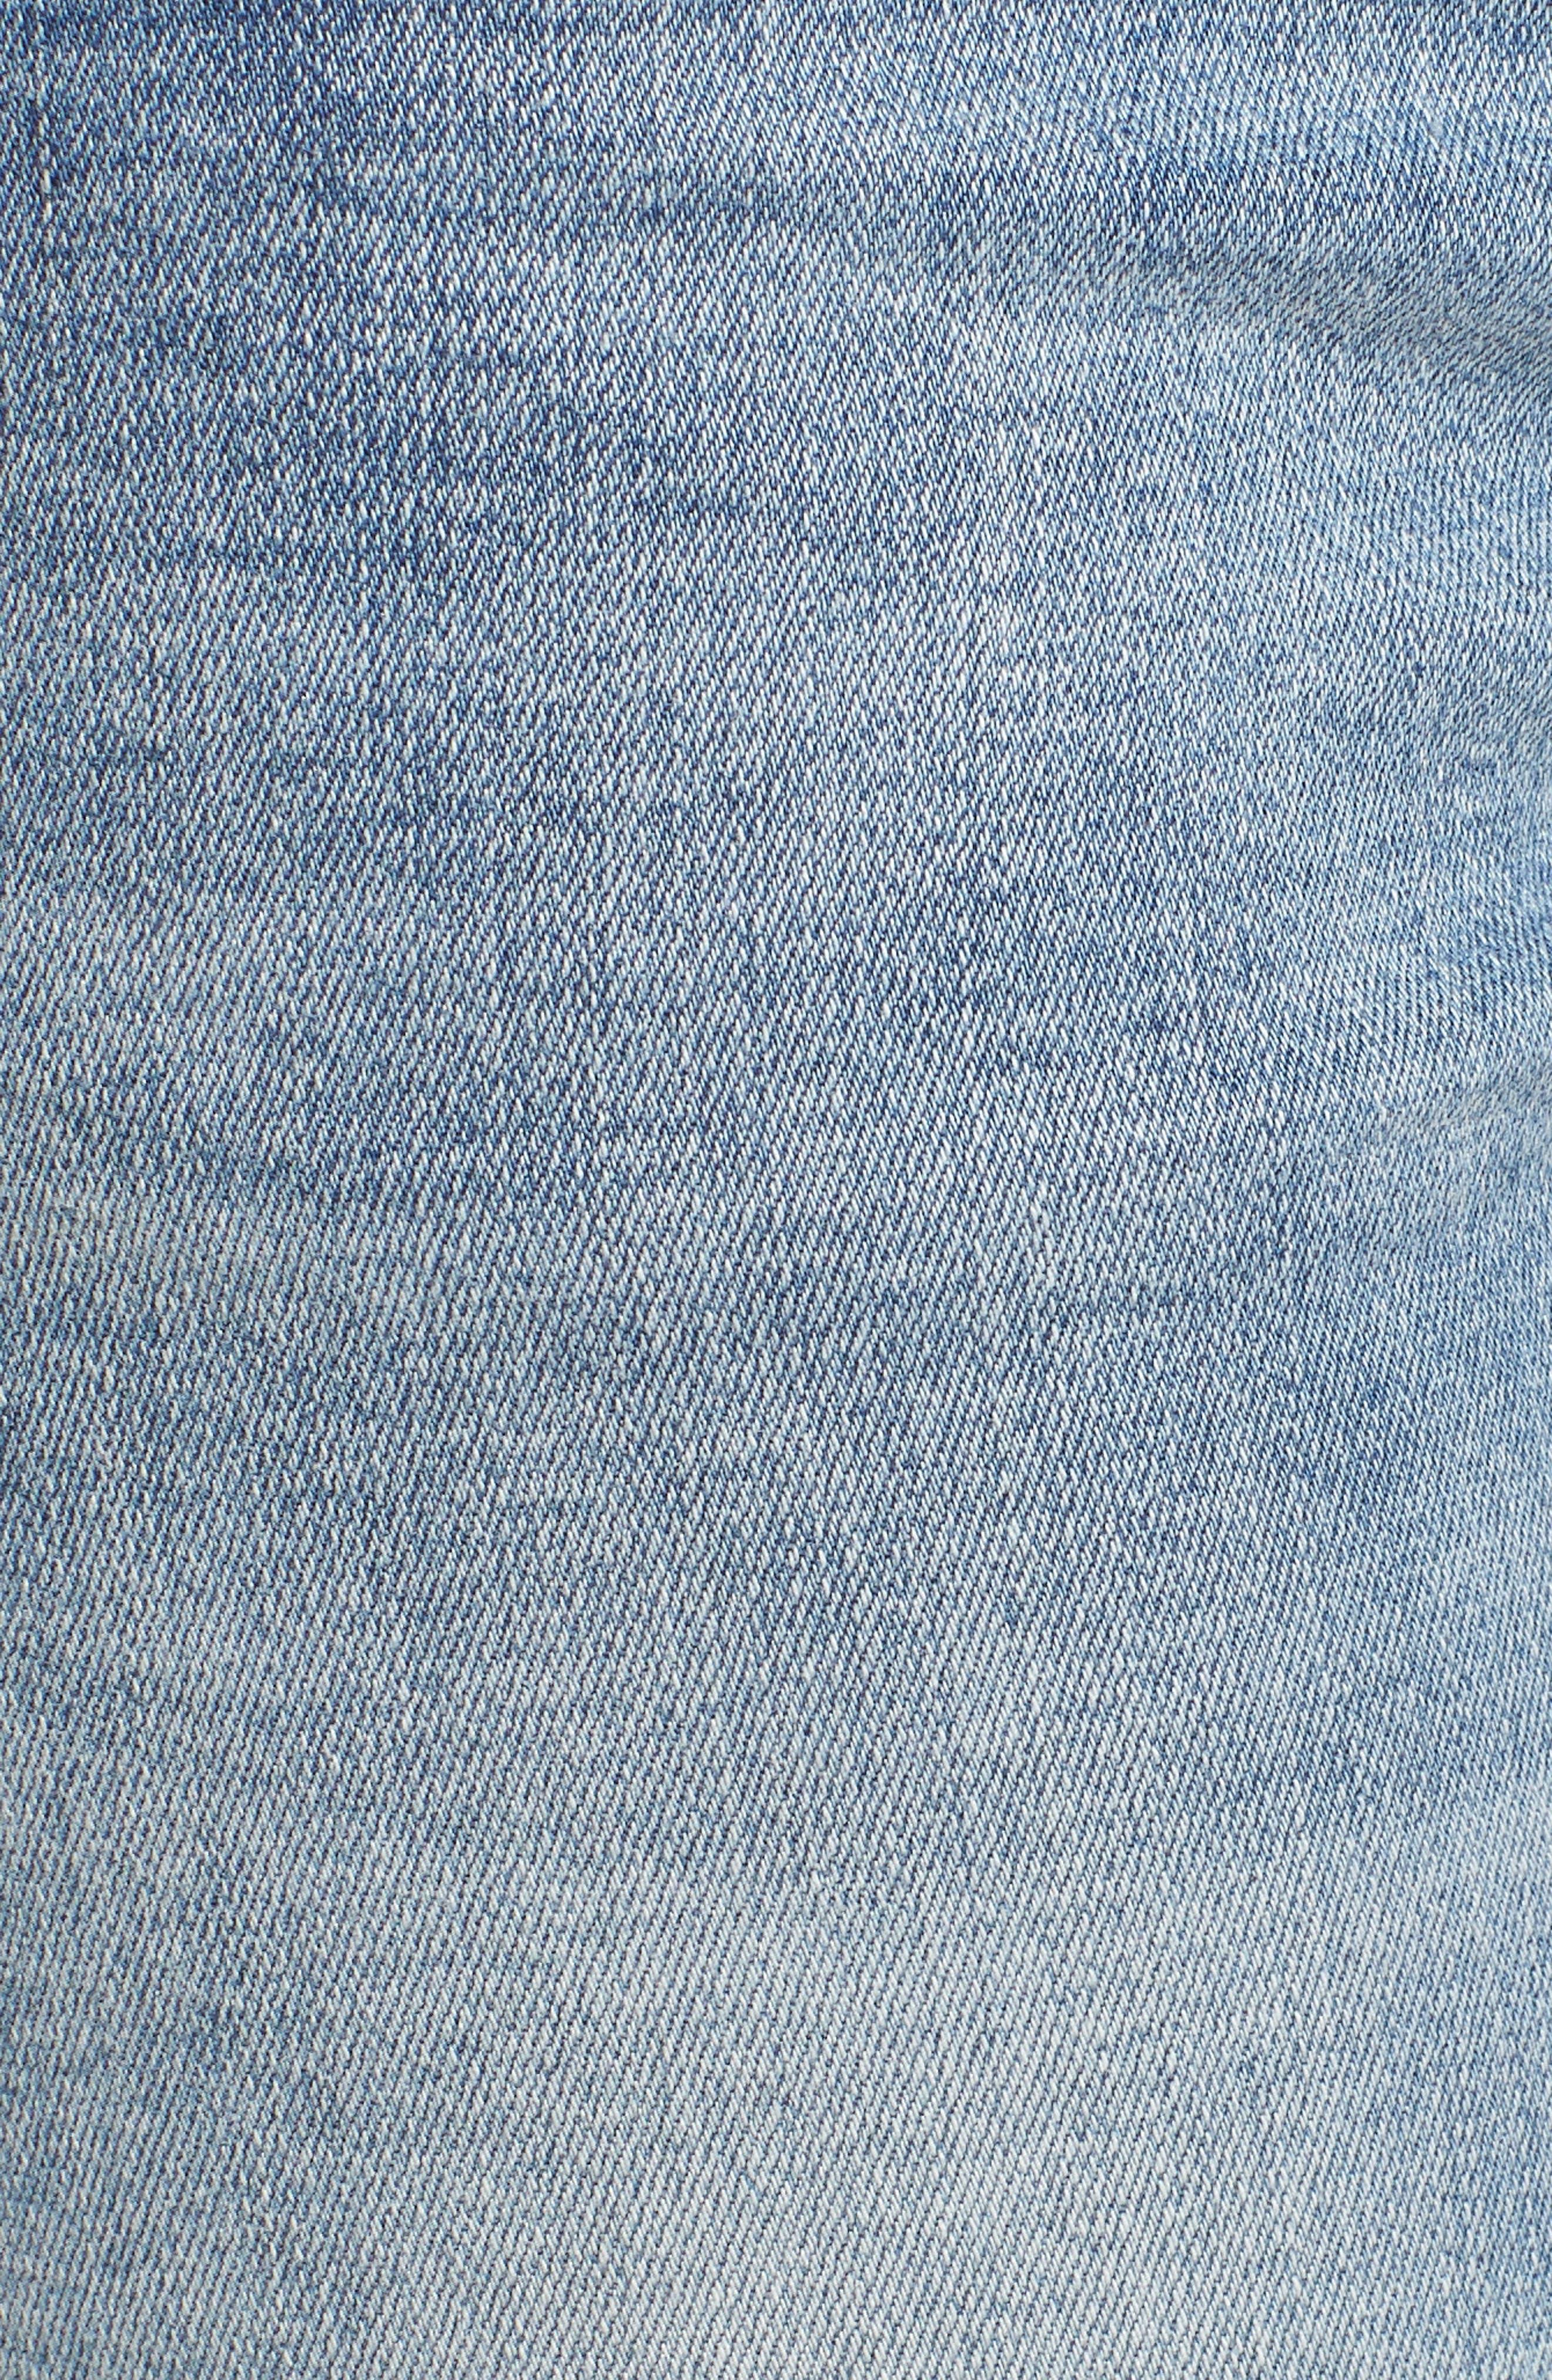 Freebirds Skinny Jeans,                             Alternate thumbnail 6, color,                             Cobaine